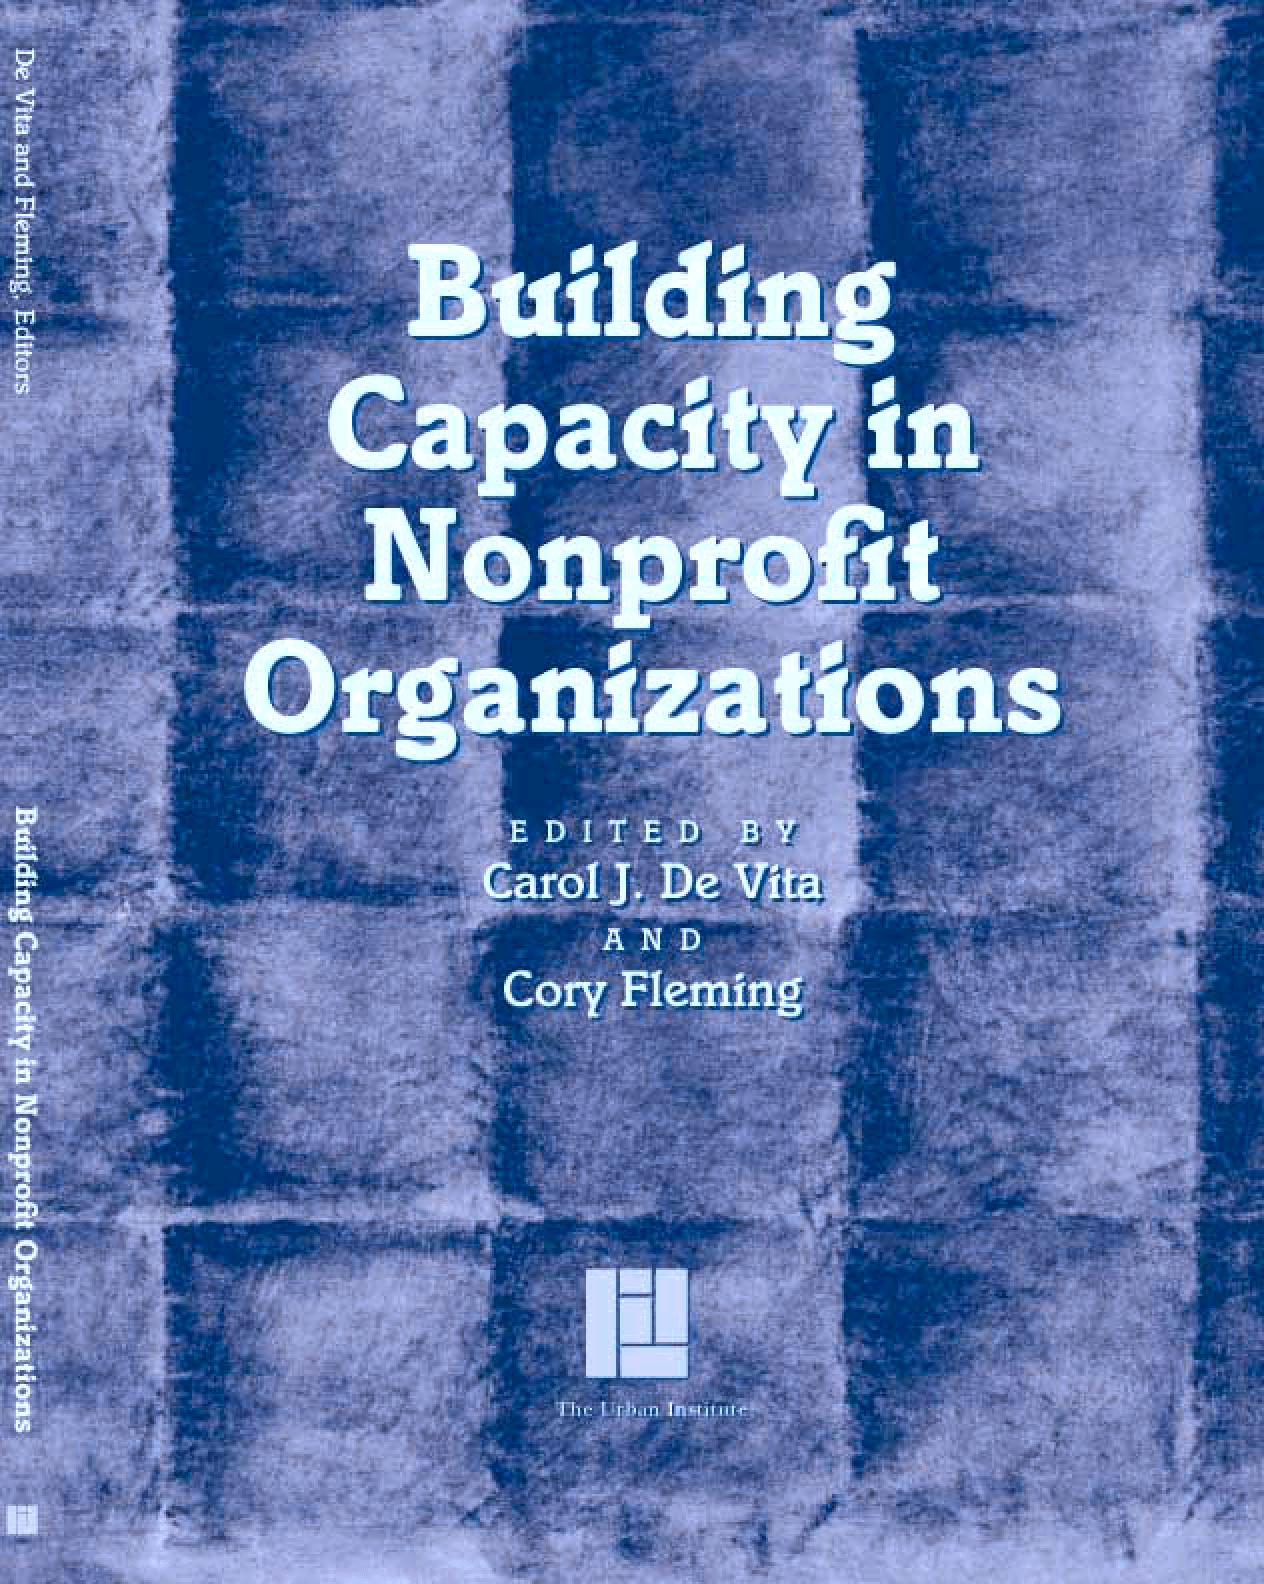 Building Capacity in Nonprofit Organizations